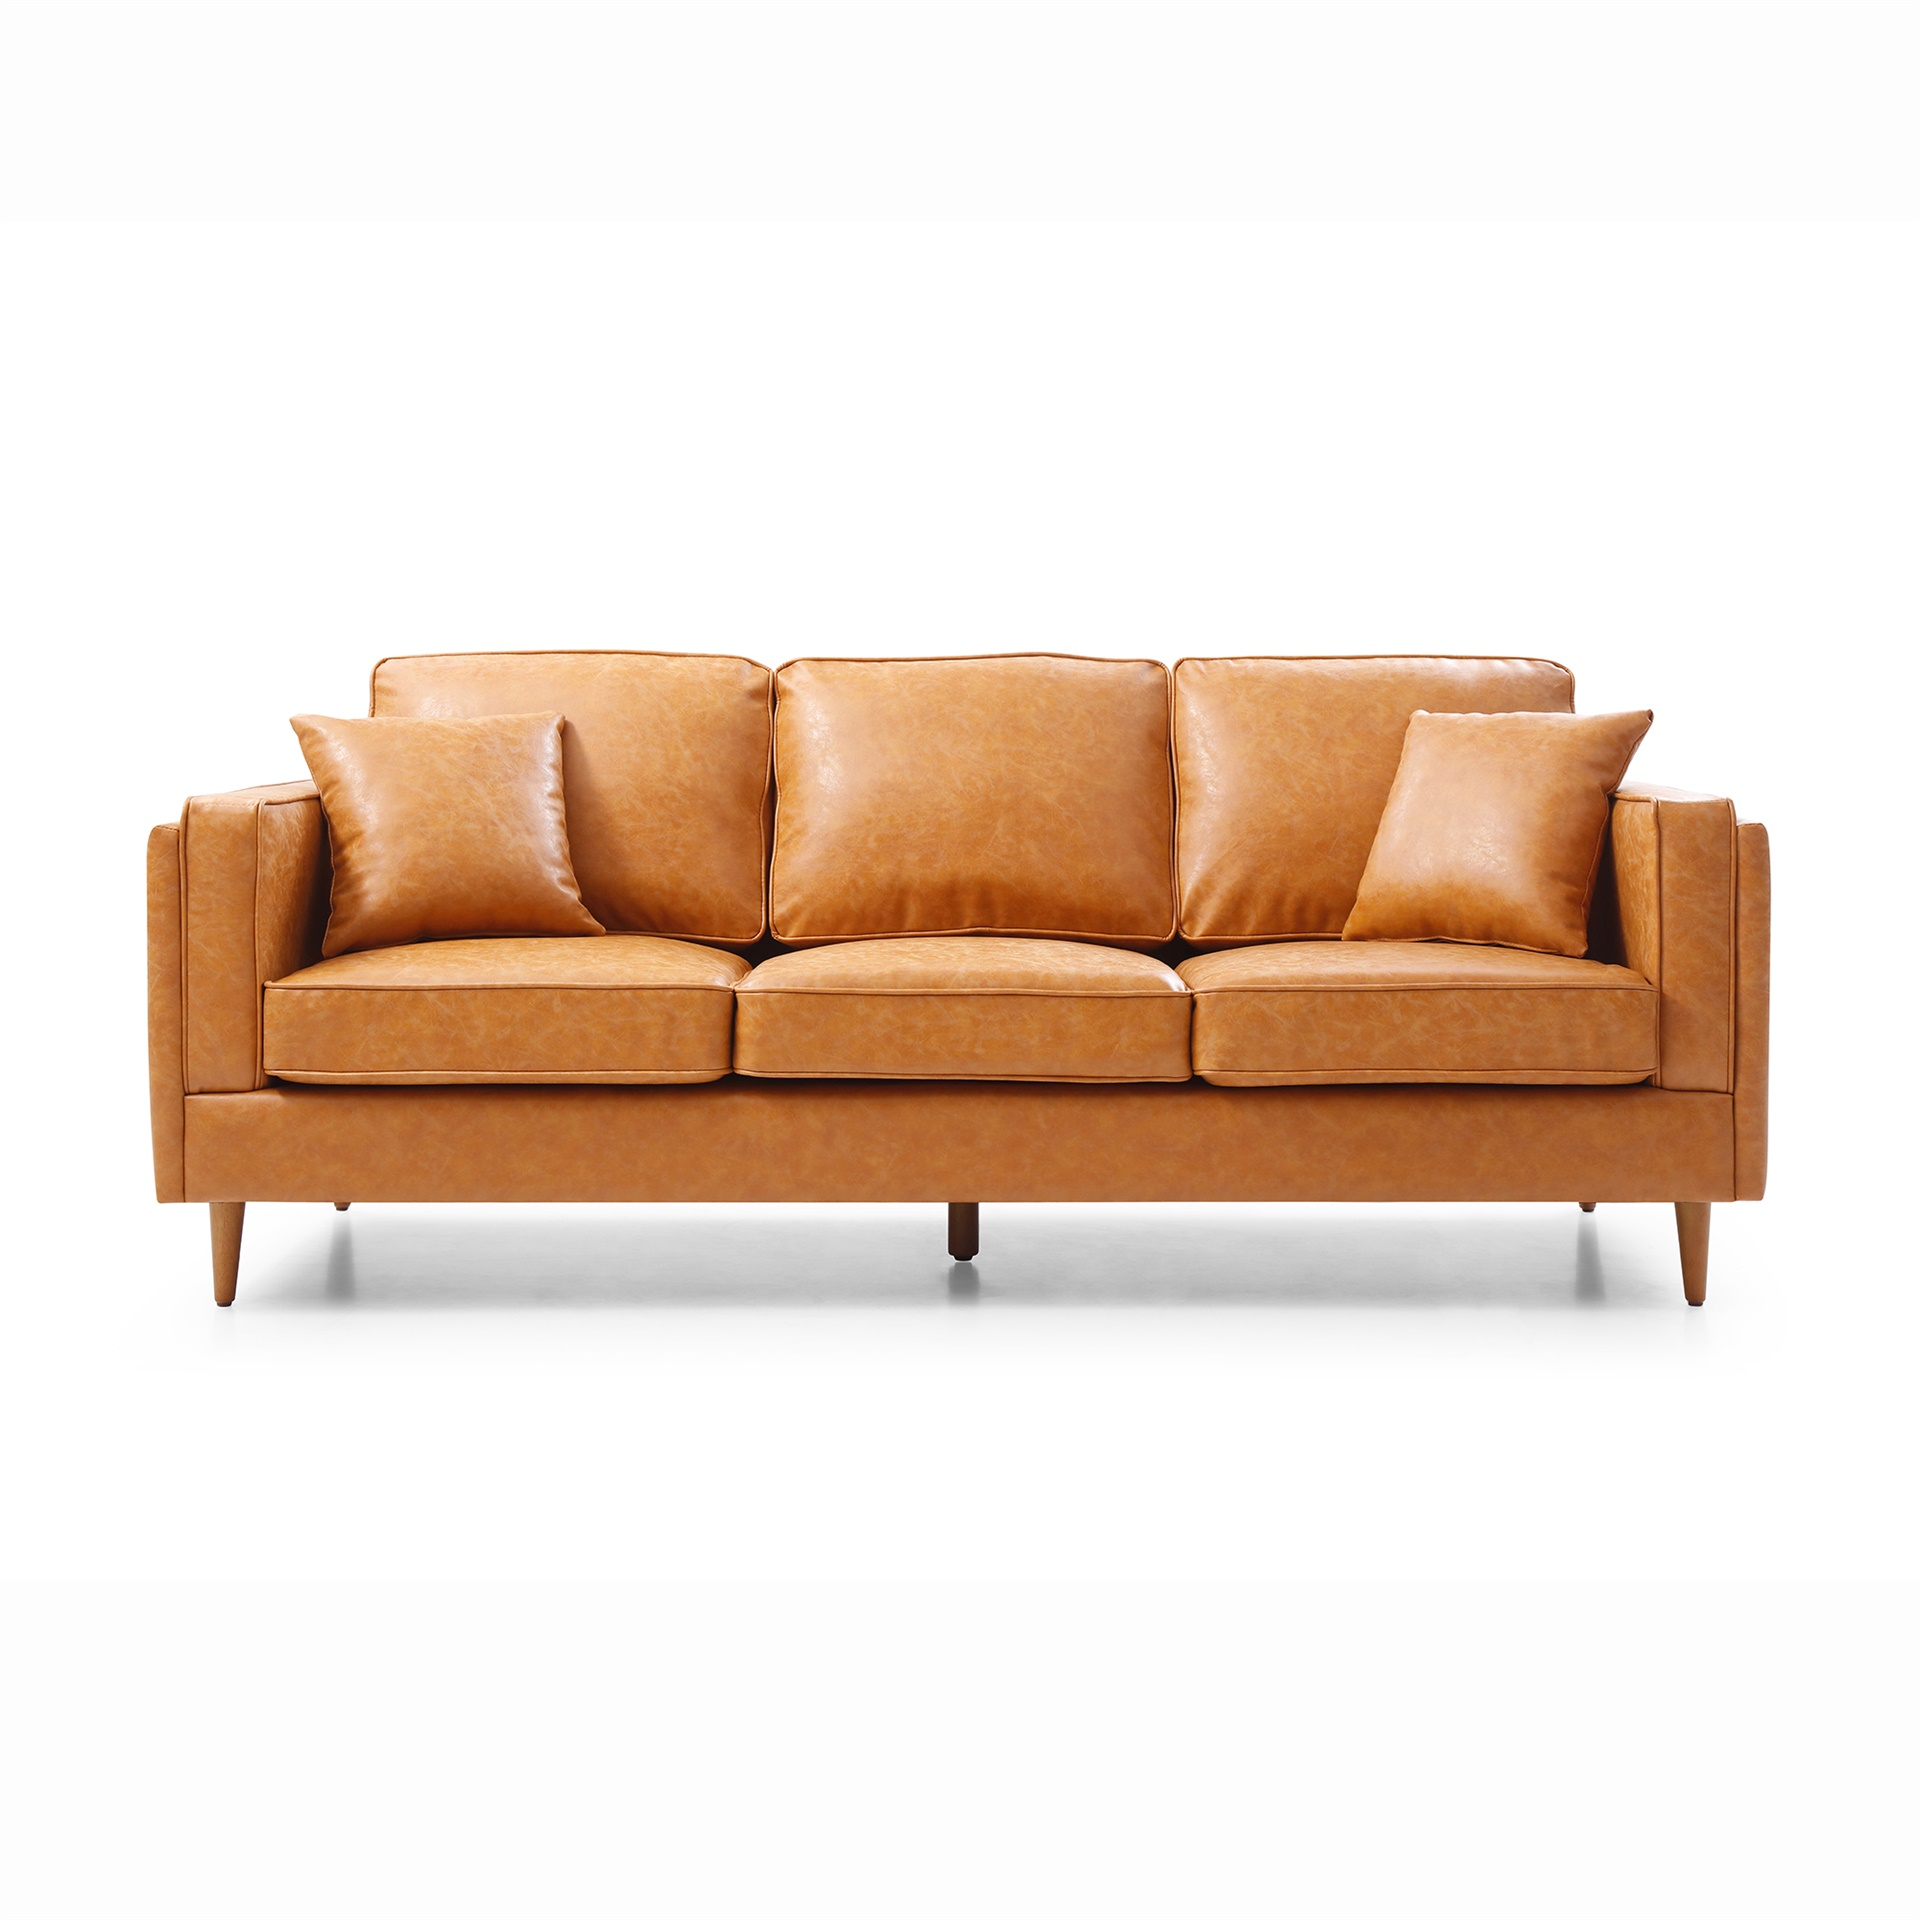 Astounding Greyson Sofa Machost Co Dining Chair Design Ideas Machostcouk